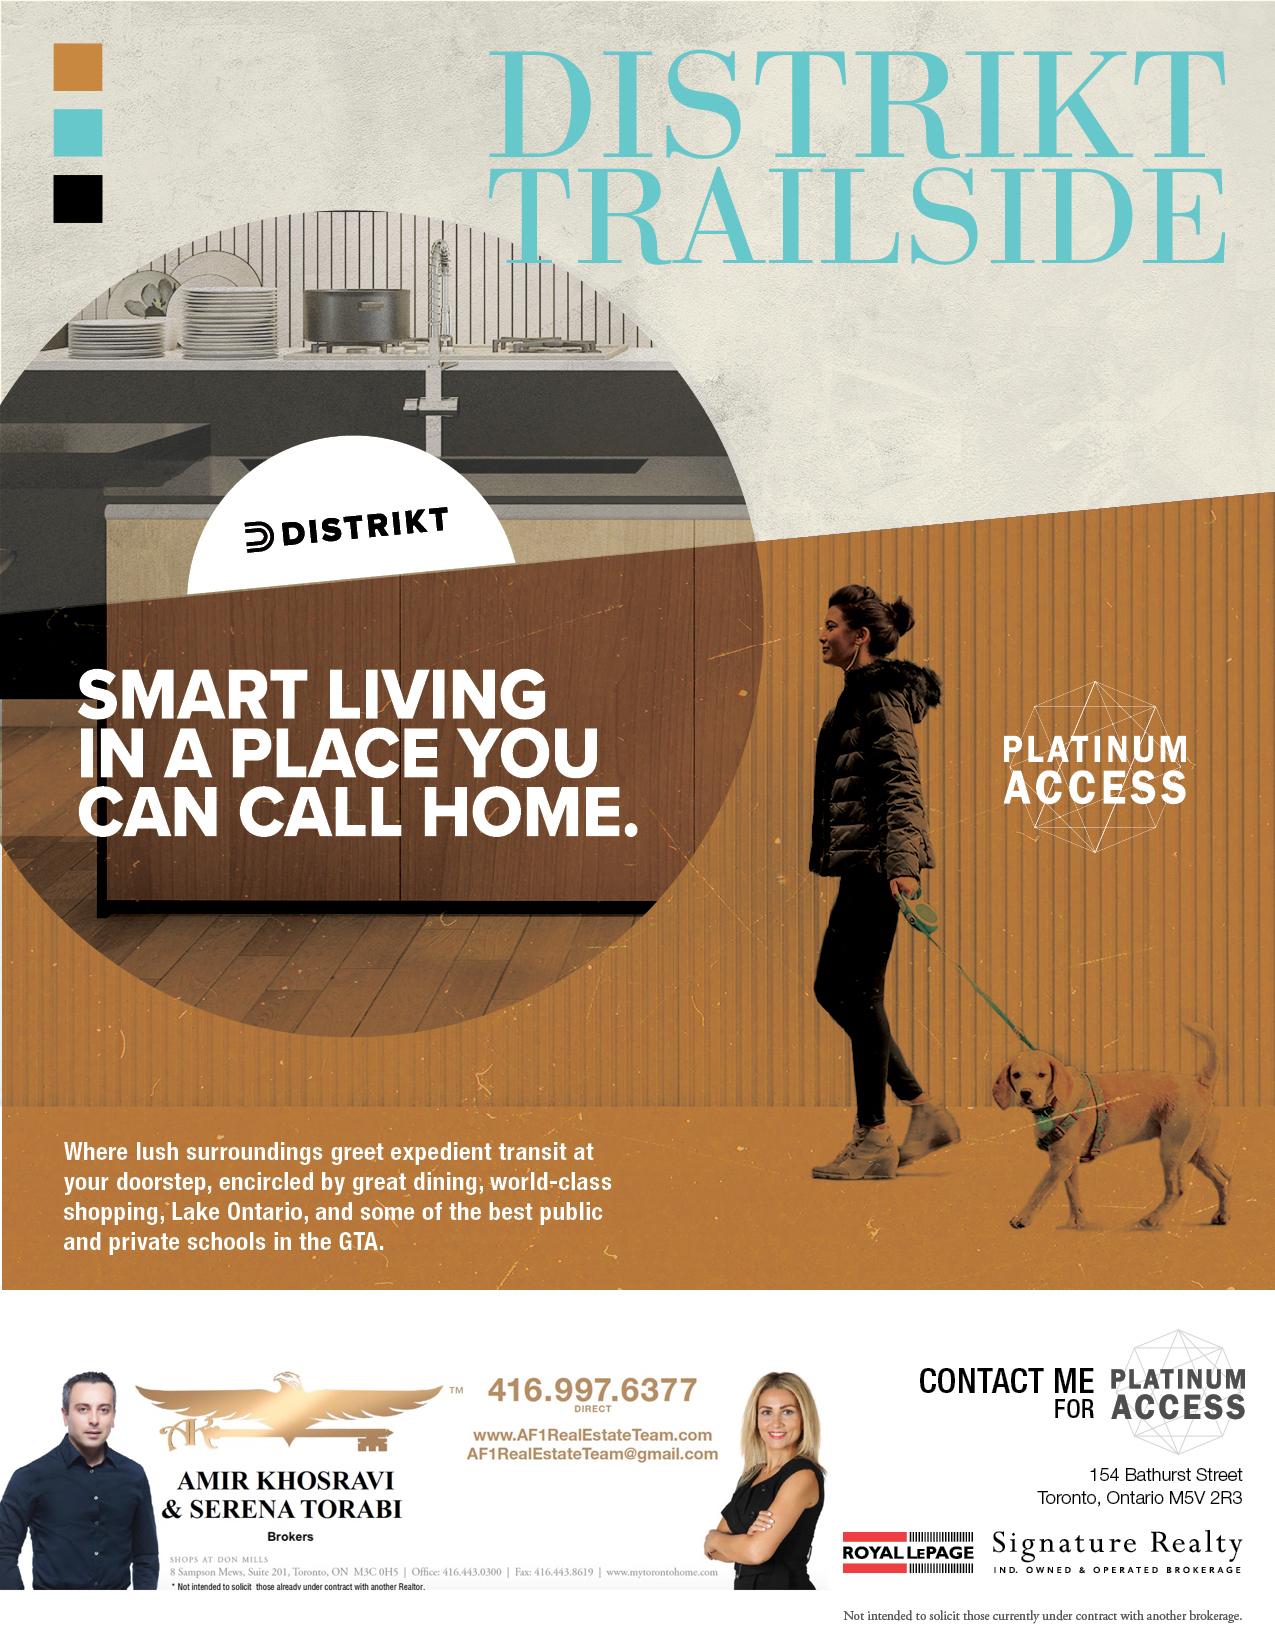 Distrikt Trailside Condos